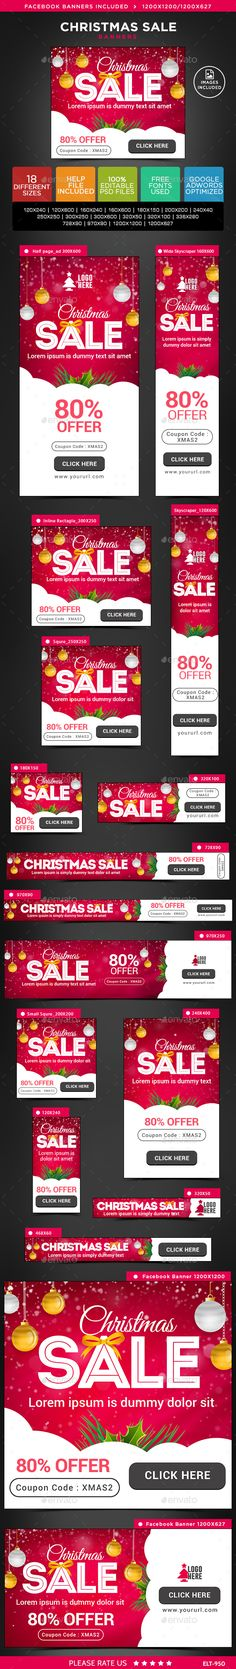 Black Friday Sale Flyer Template Flyer template, Psd templates - coupon flyer template